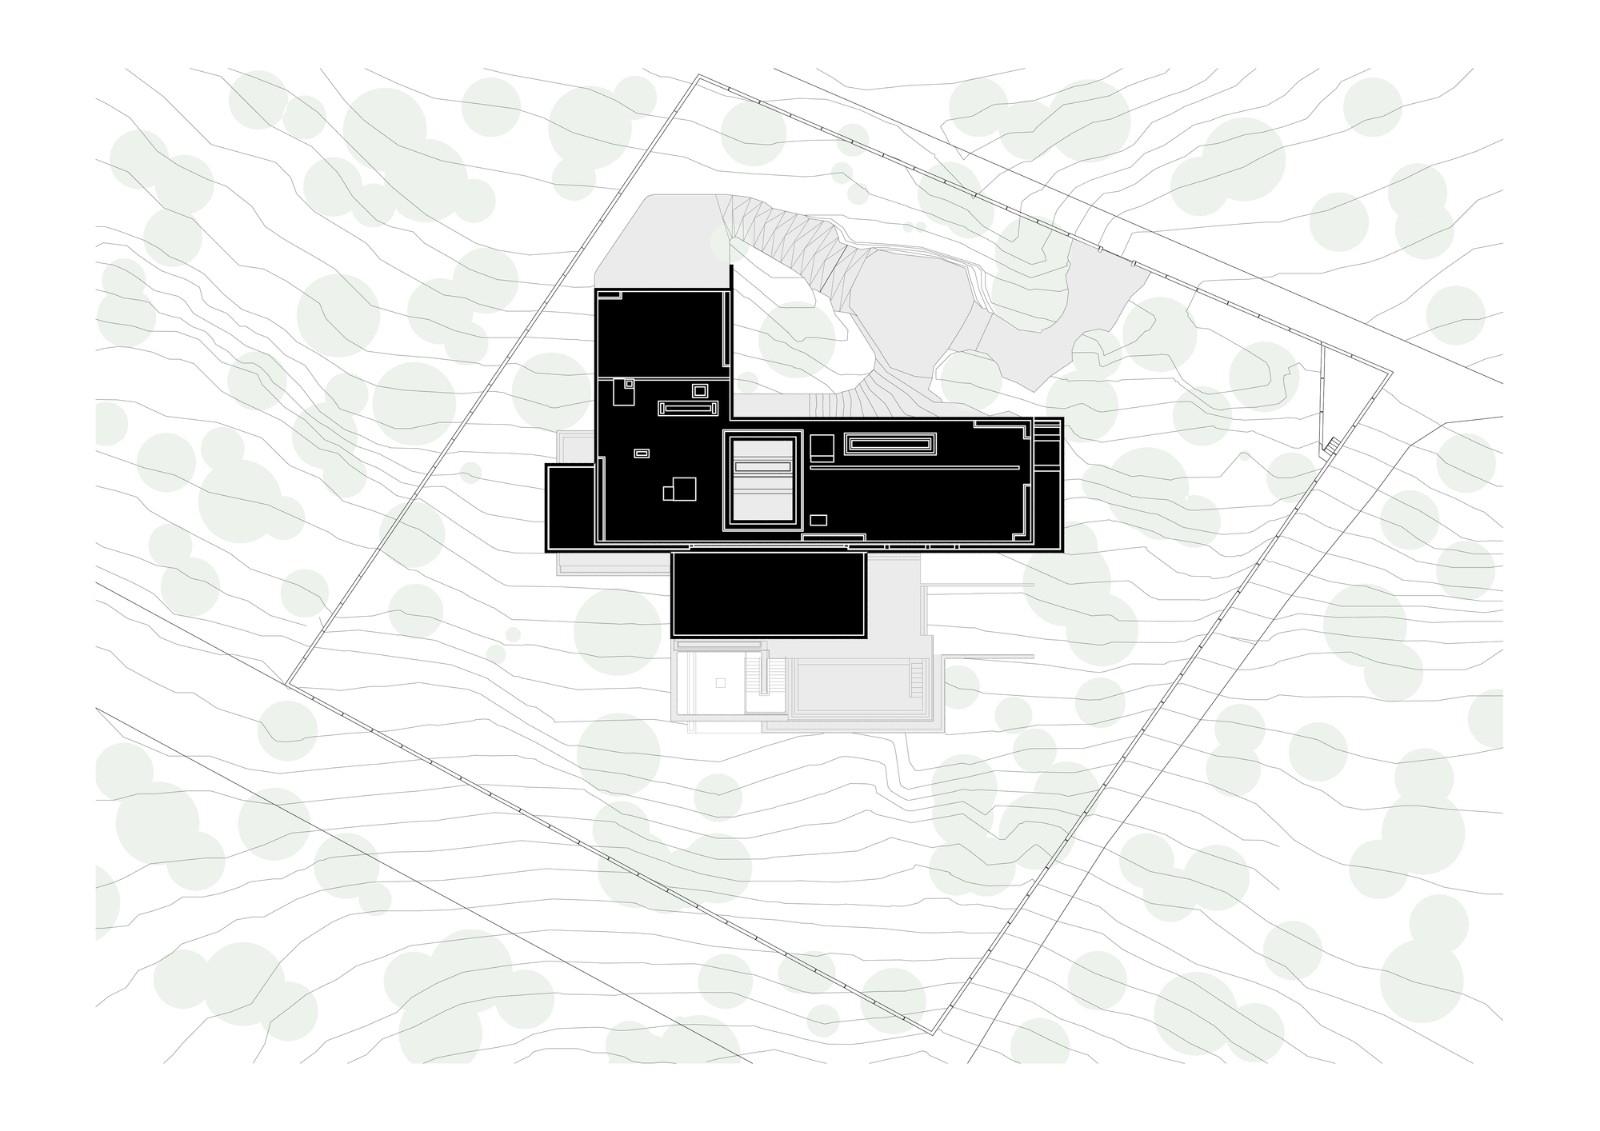 http://img.zhux2.com/editor1589983952694974.jpg